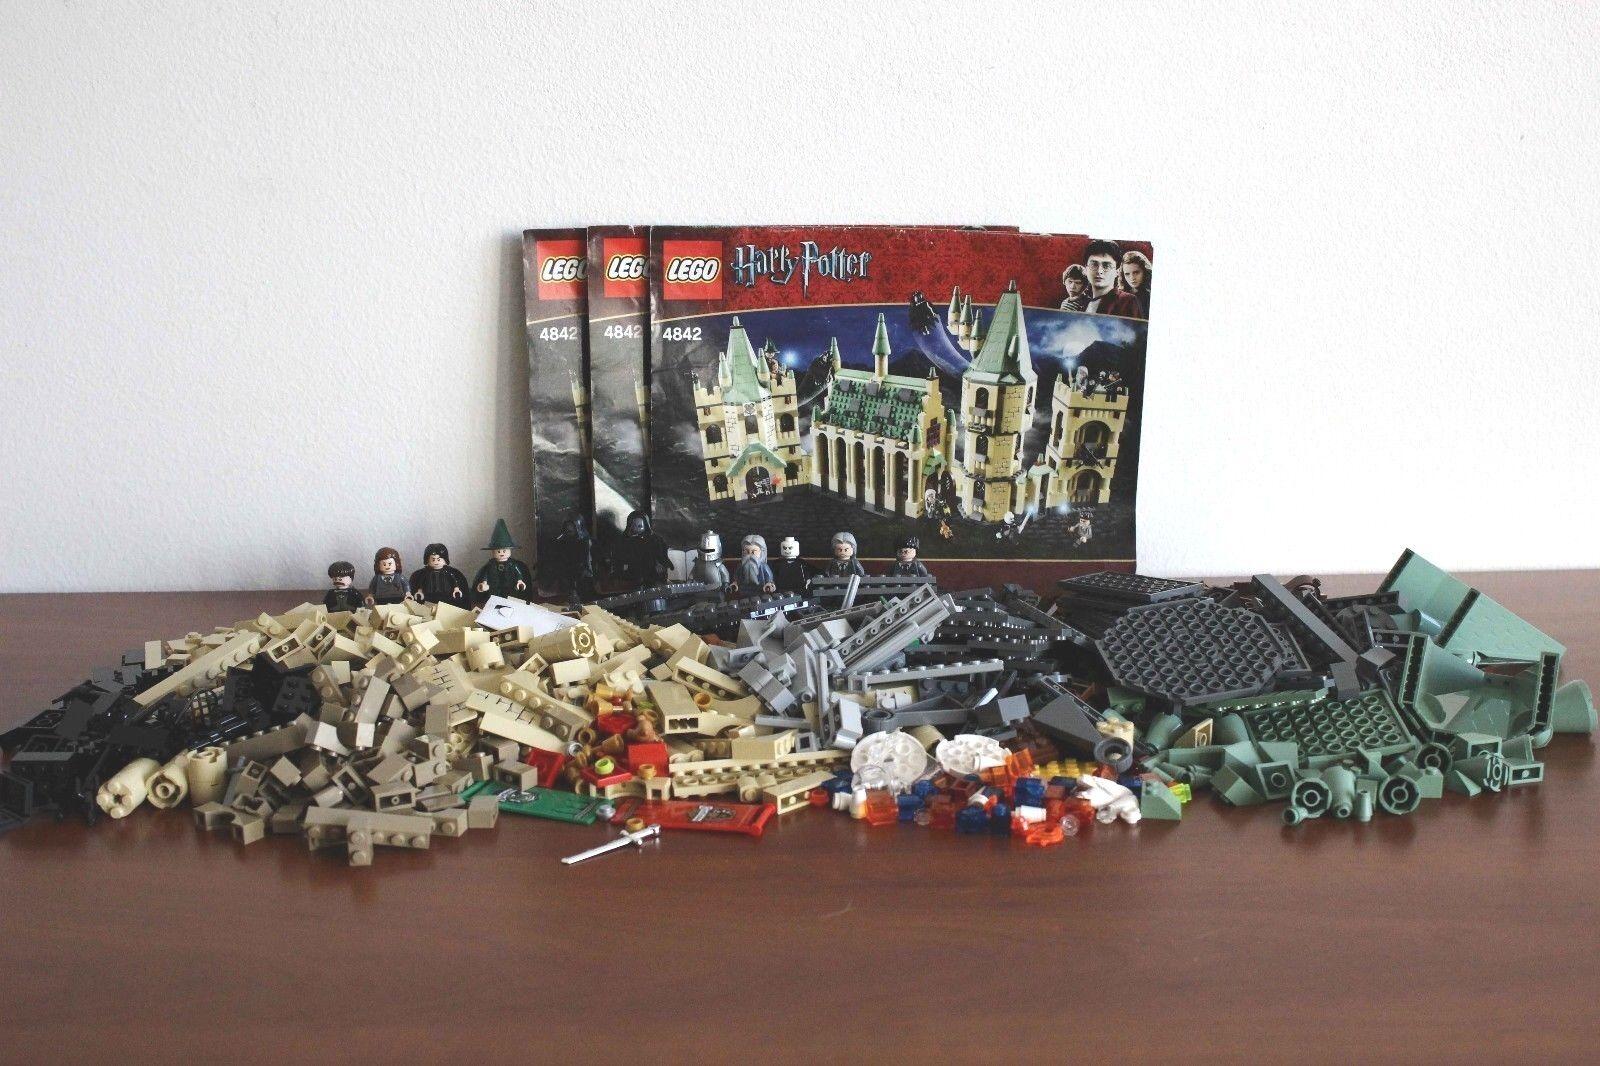 Lego Harry Potter Set 4842-1 Hogwarts Castle 100% completare +  instructions  vendita di offerte